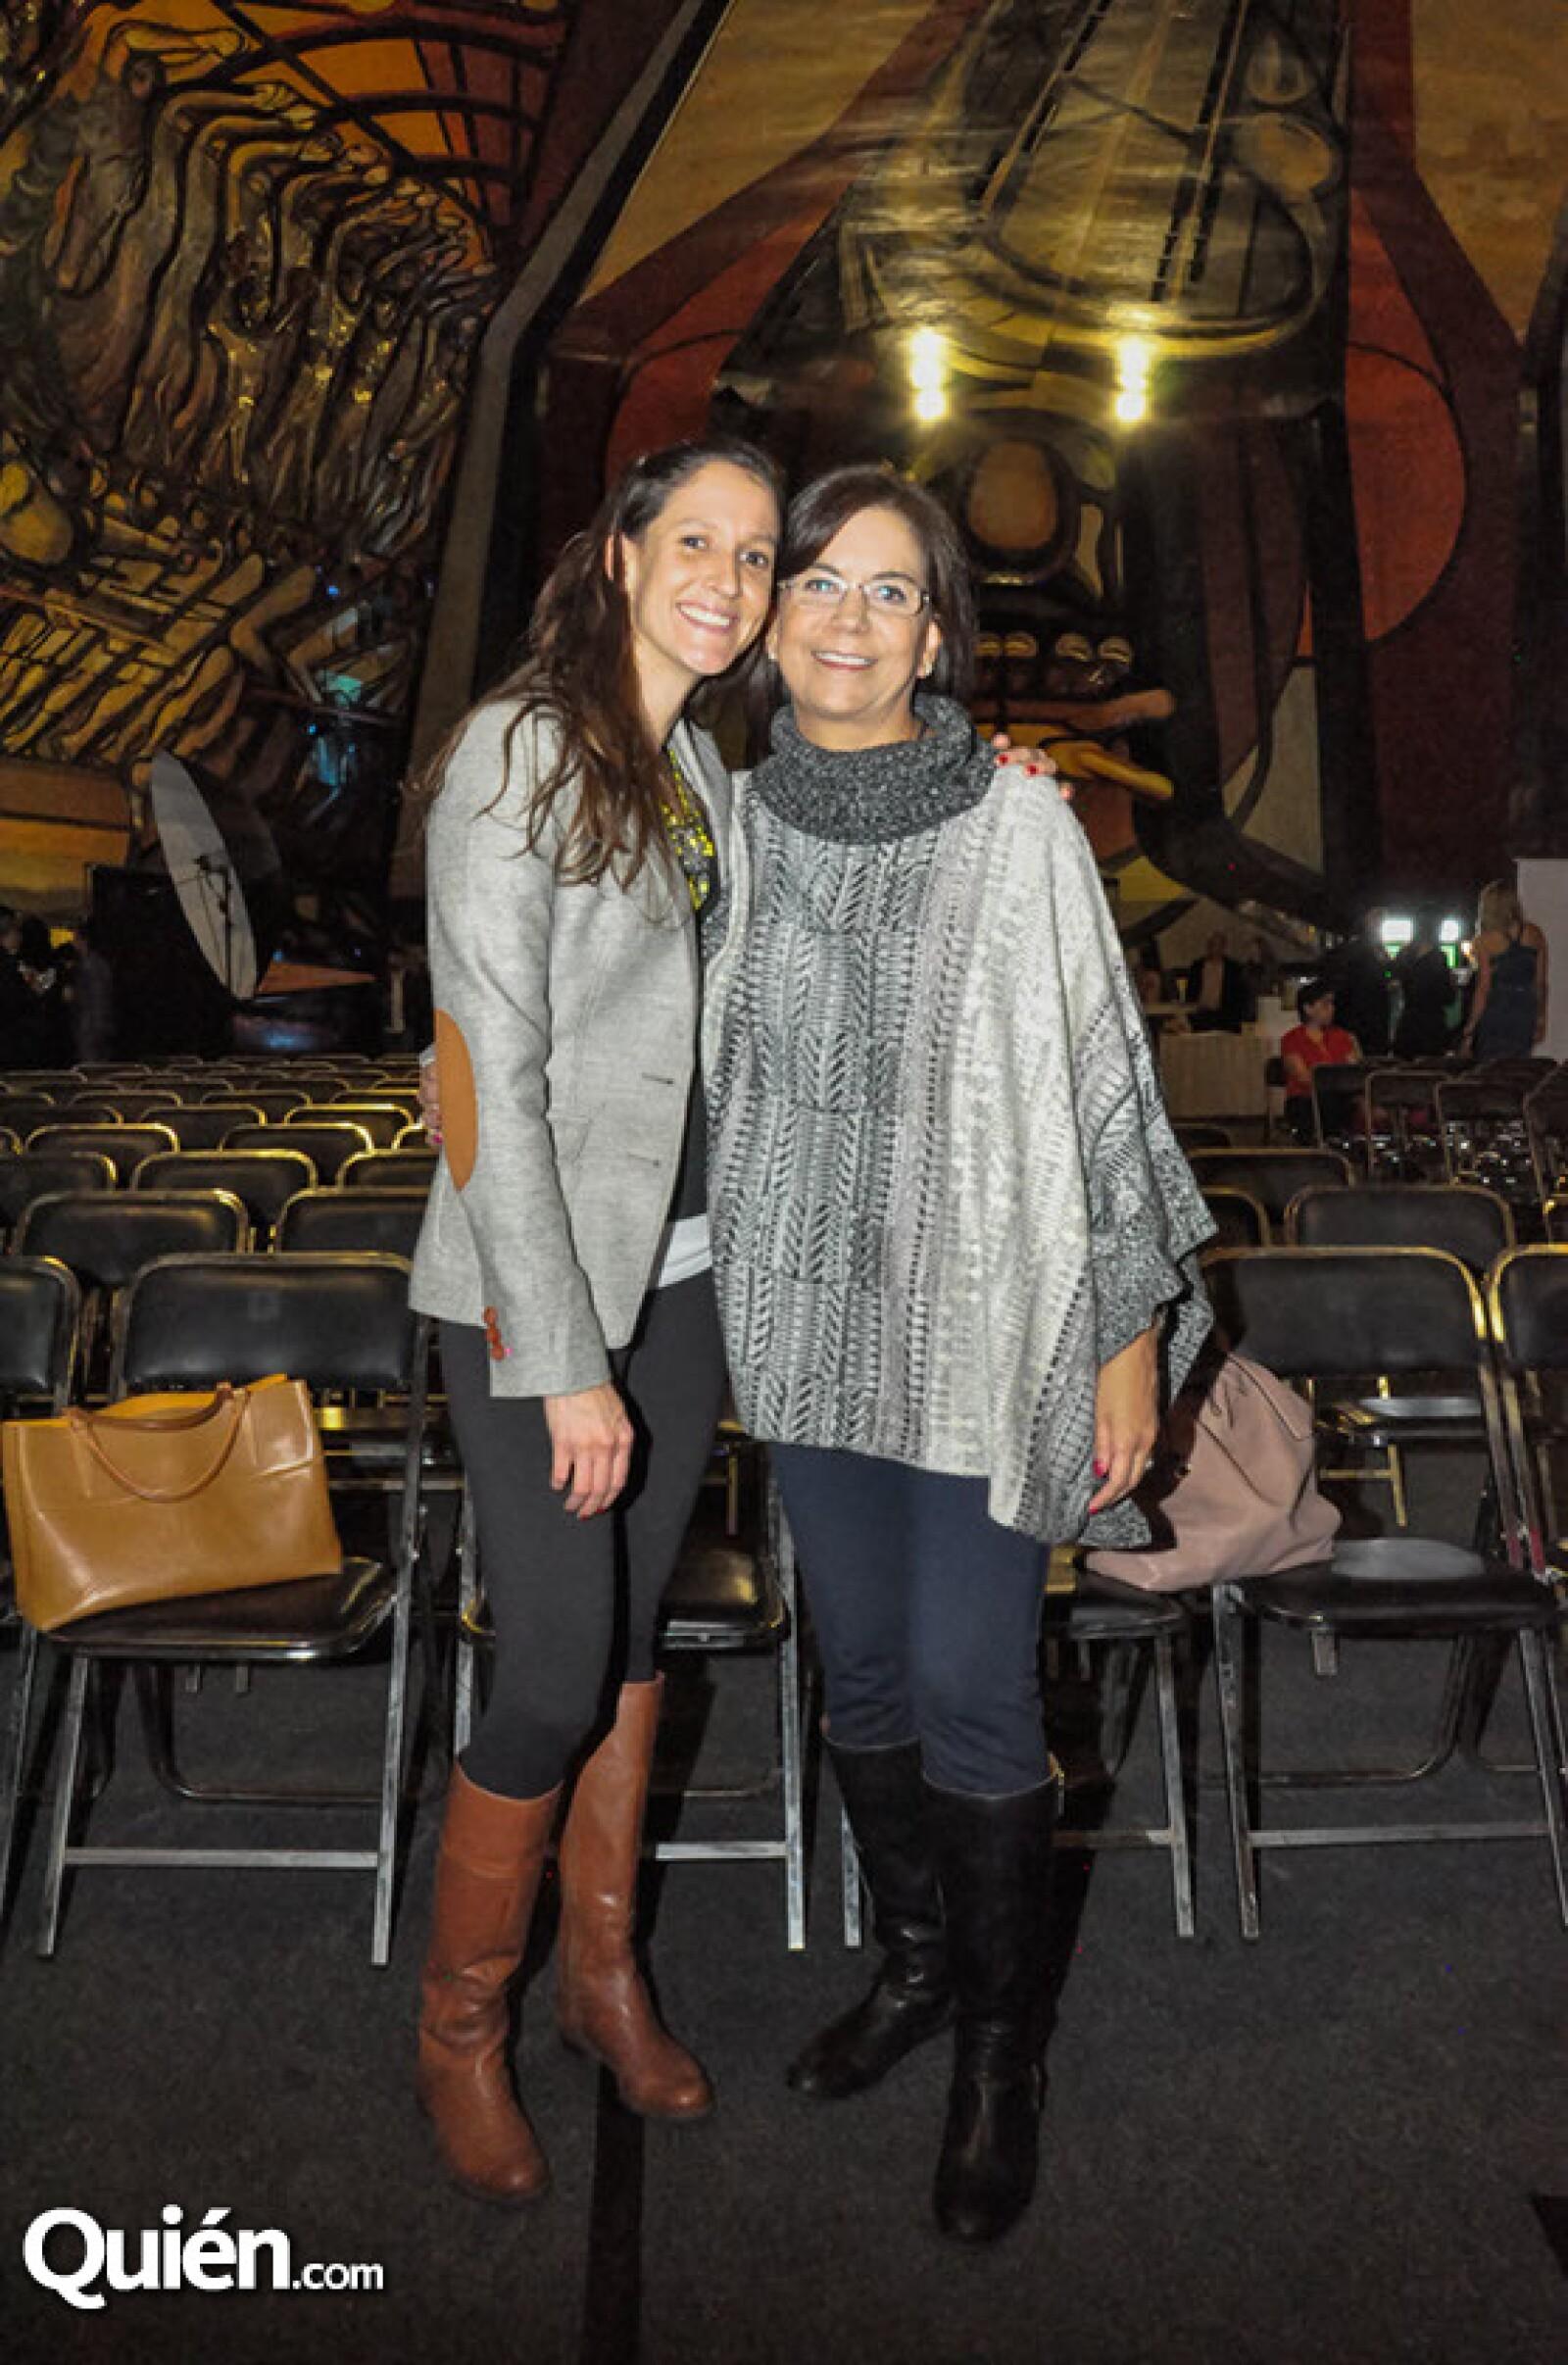 Ines Pardo y Marissa Quiroga